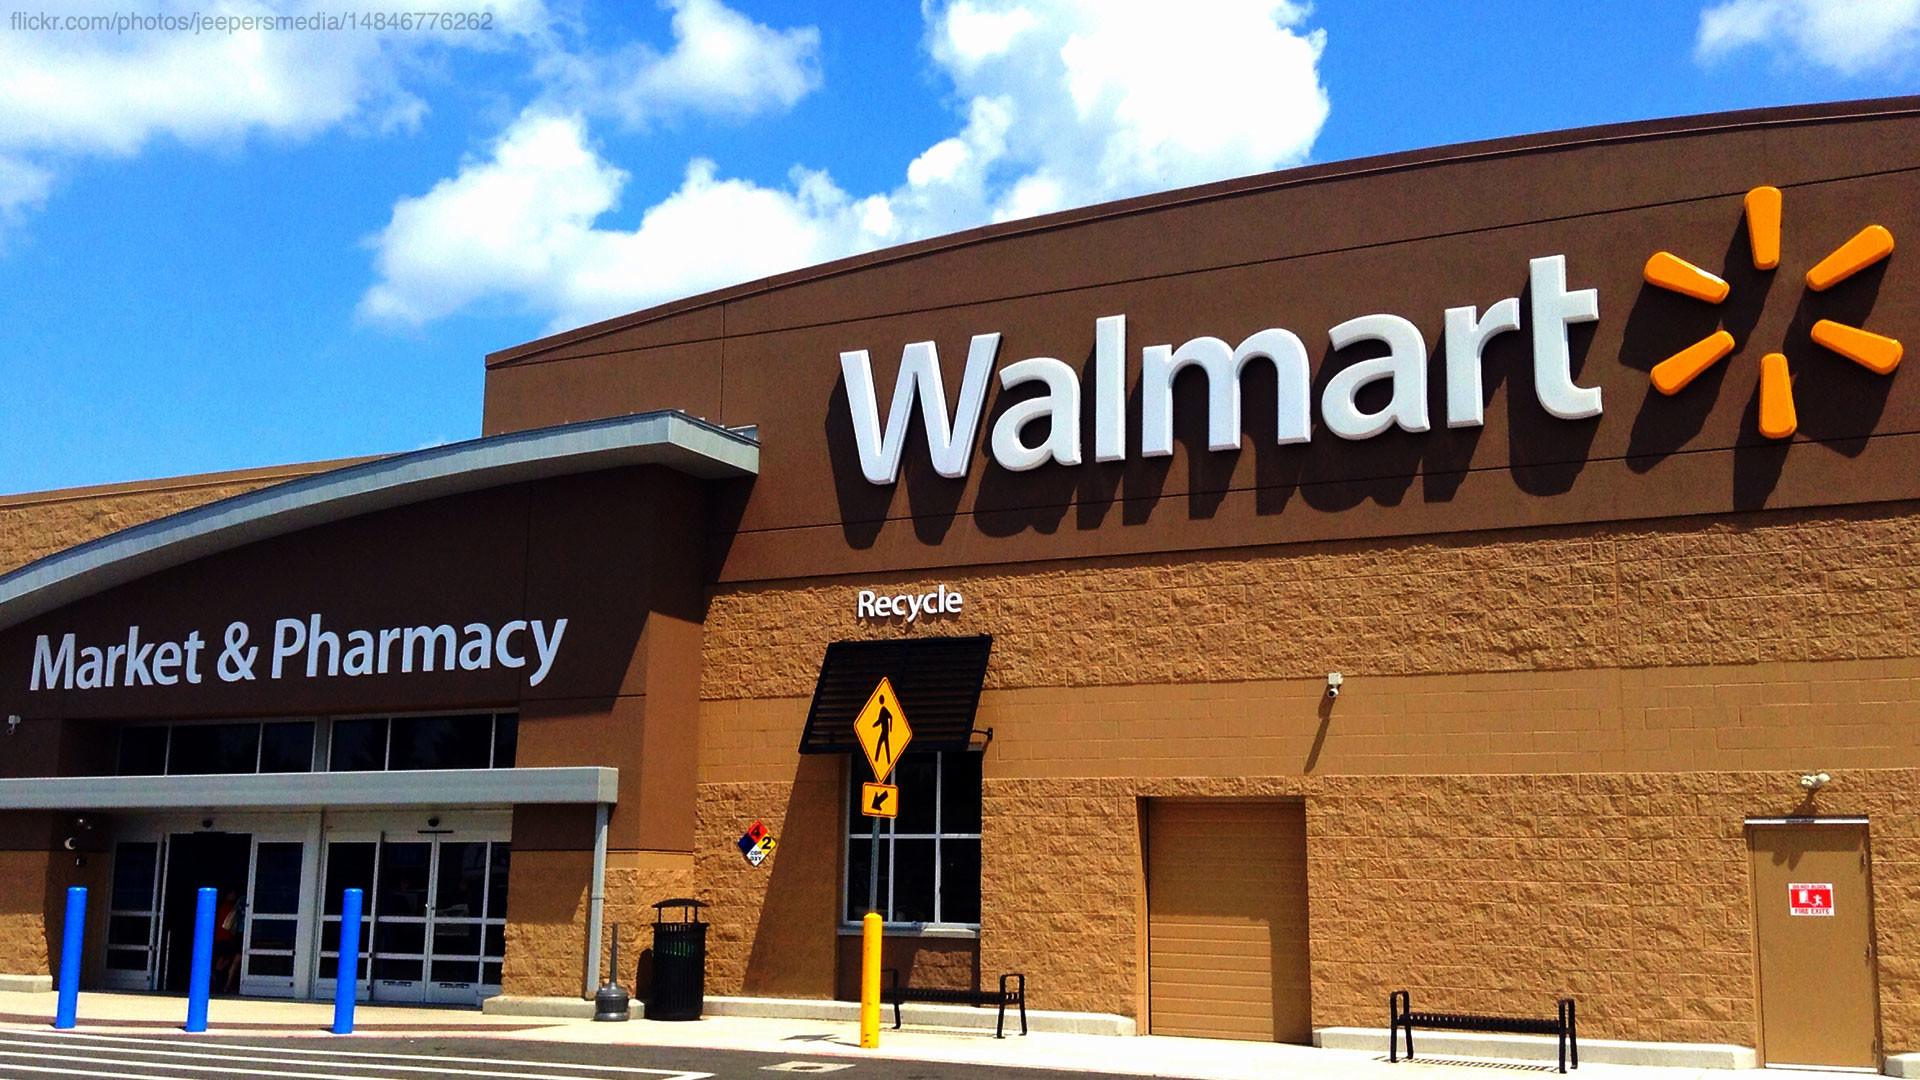 Walmart Wallpaper 183 ① Wallpapertag